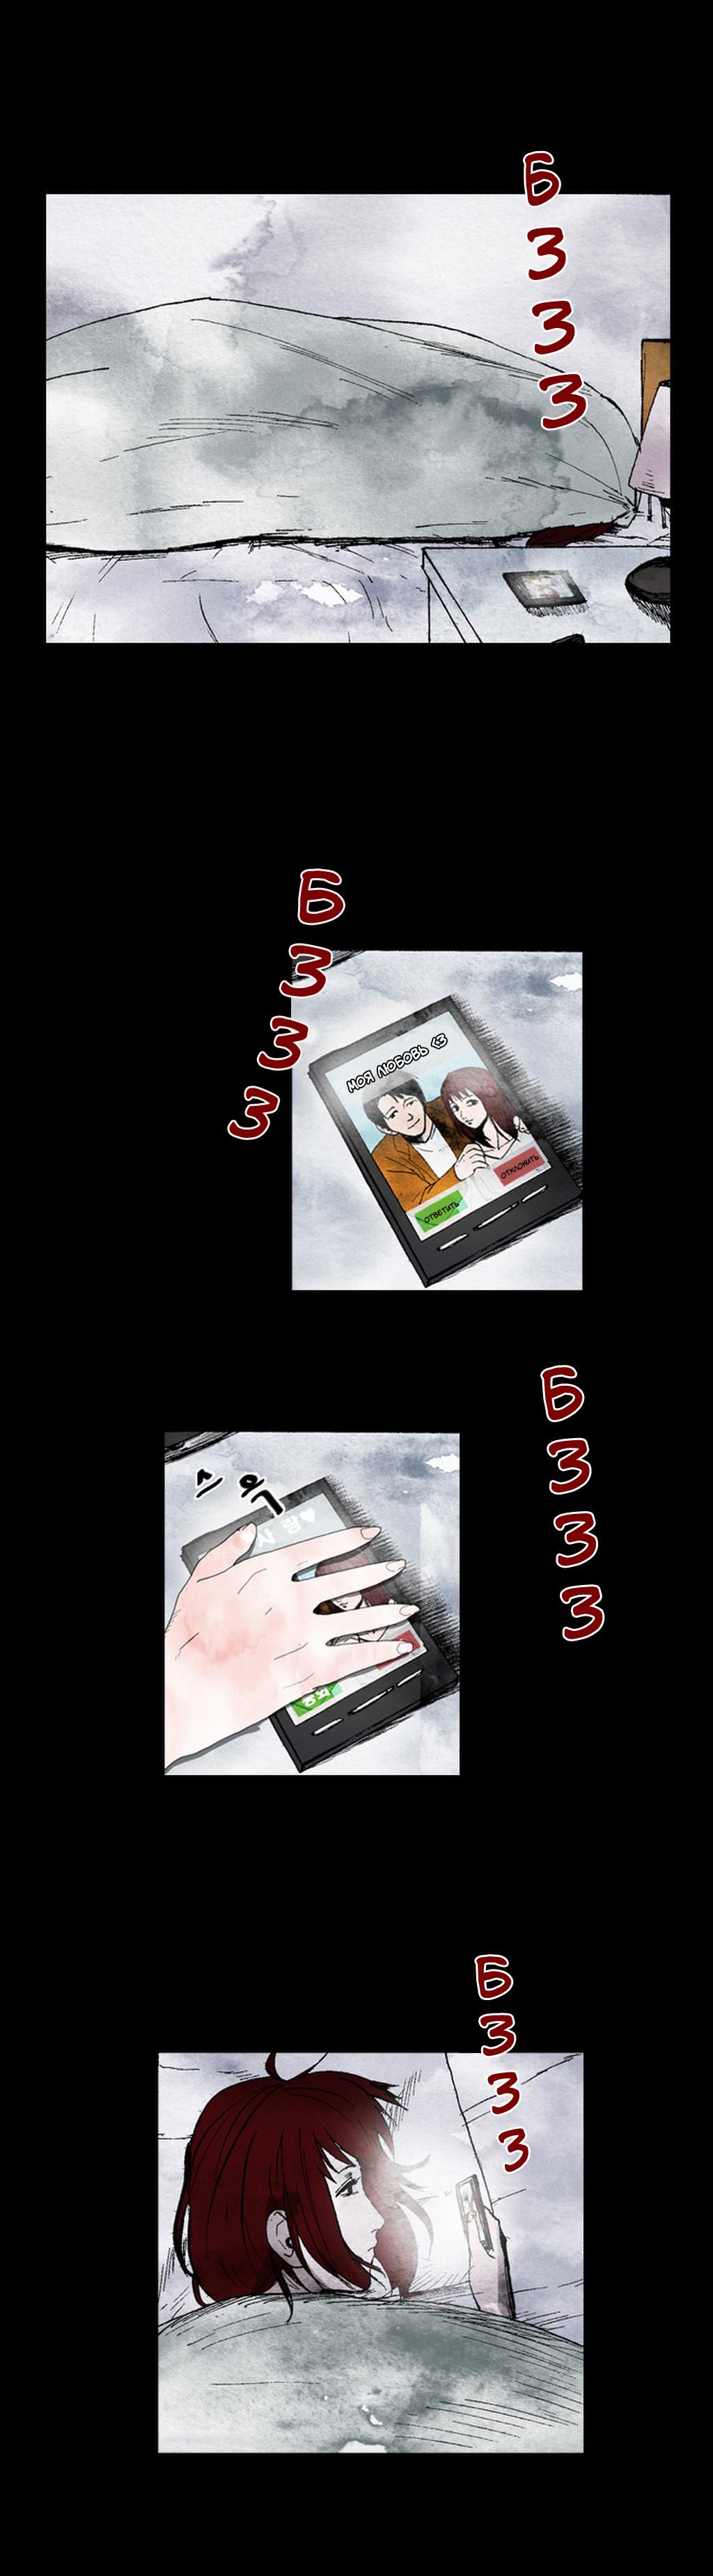 https://r1.ninemanga.com/comics/pic2/14/28302/307164/1470695166493.jpg Page 9